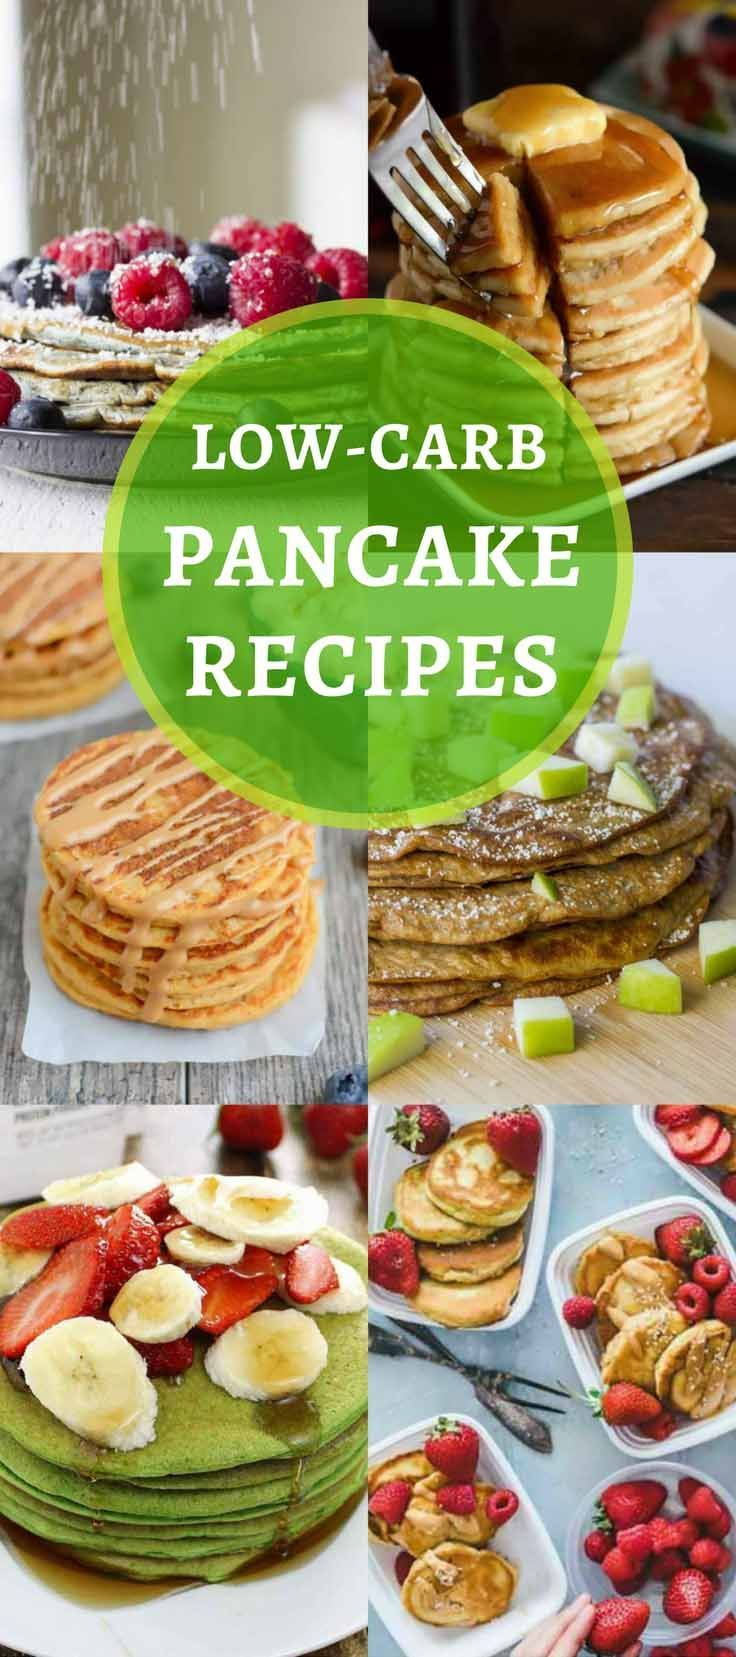 8 Diabetes Friendly Pancake Recipes Low Carb Low Carb